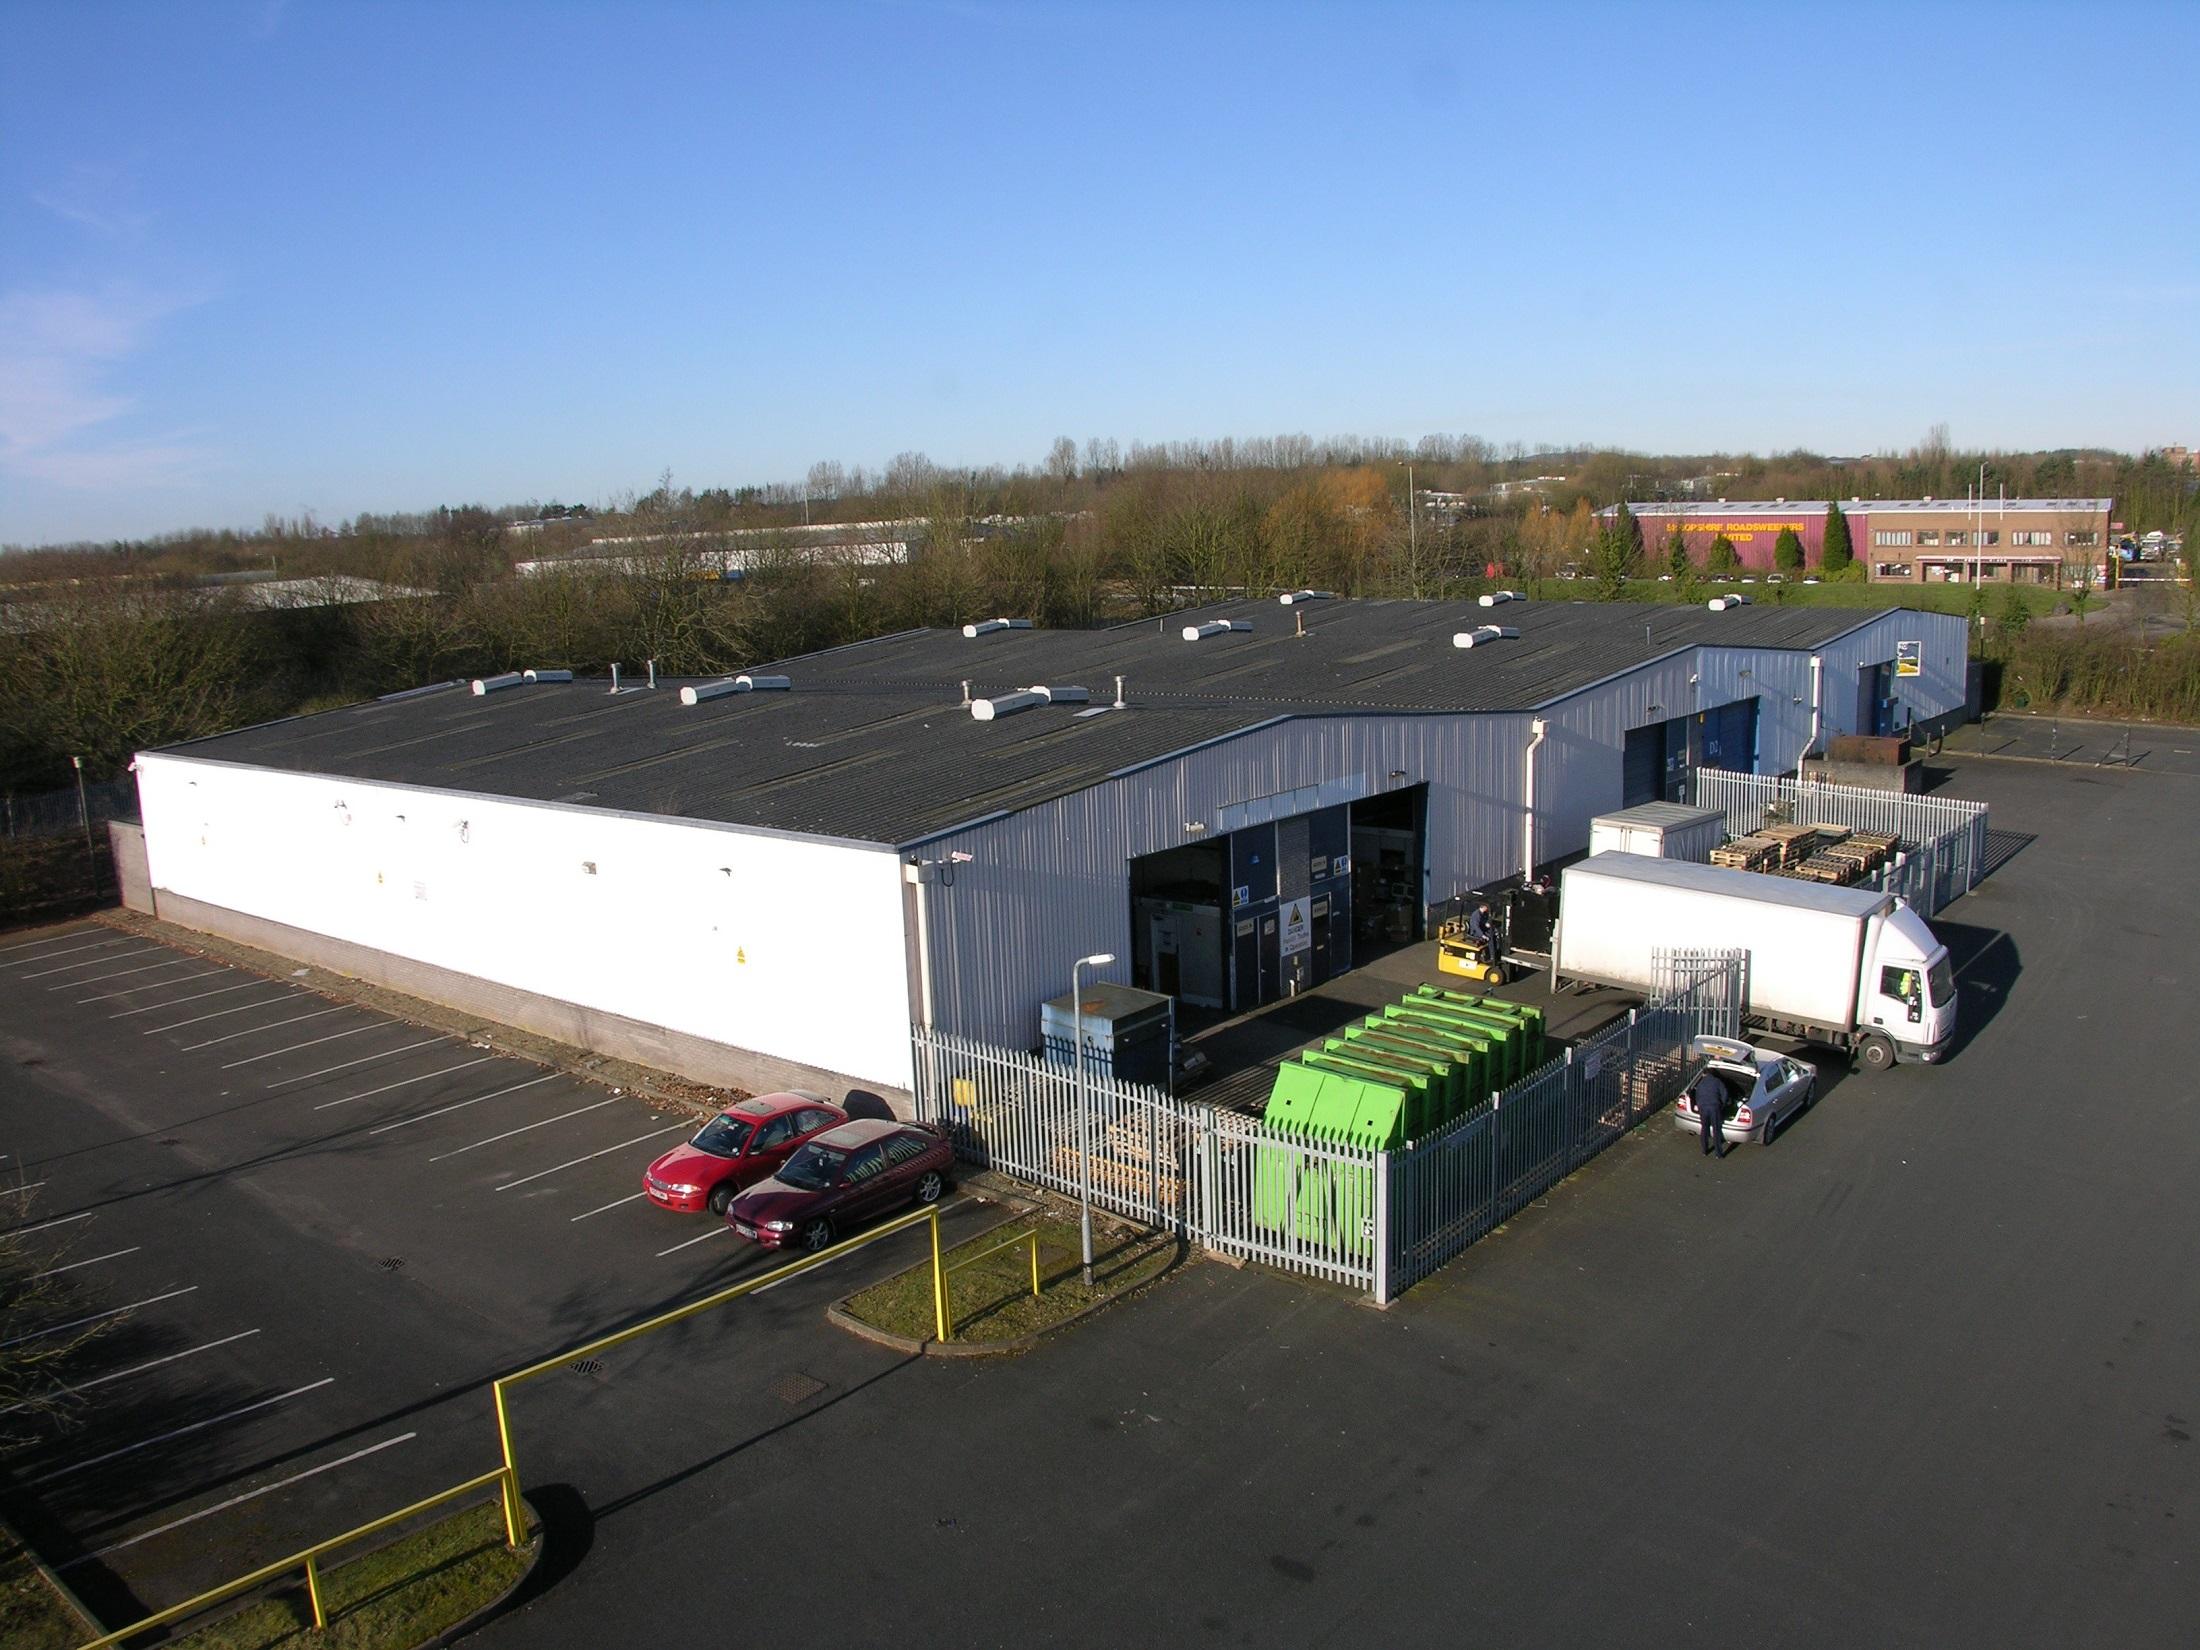 Unit D5 - Stafford Park 4, Telford, Shropshire, TF3 3BA